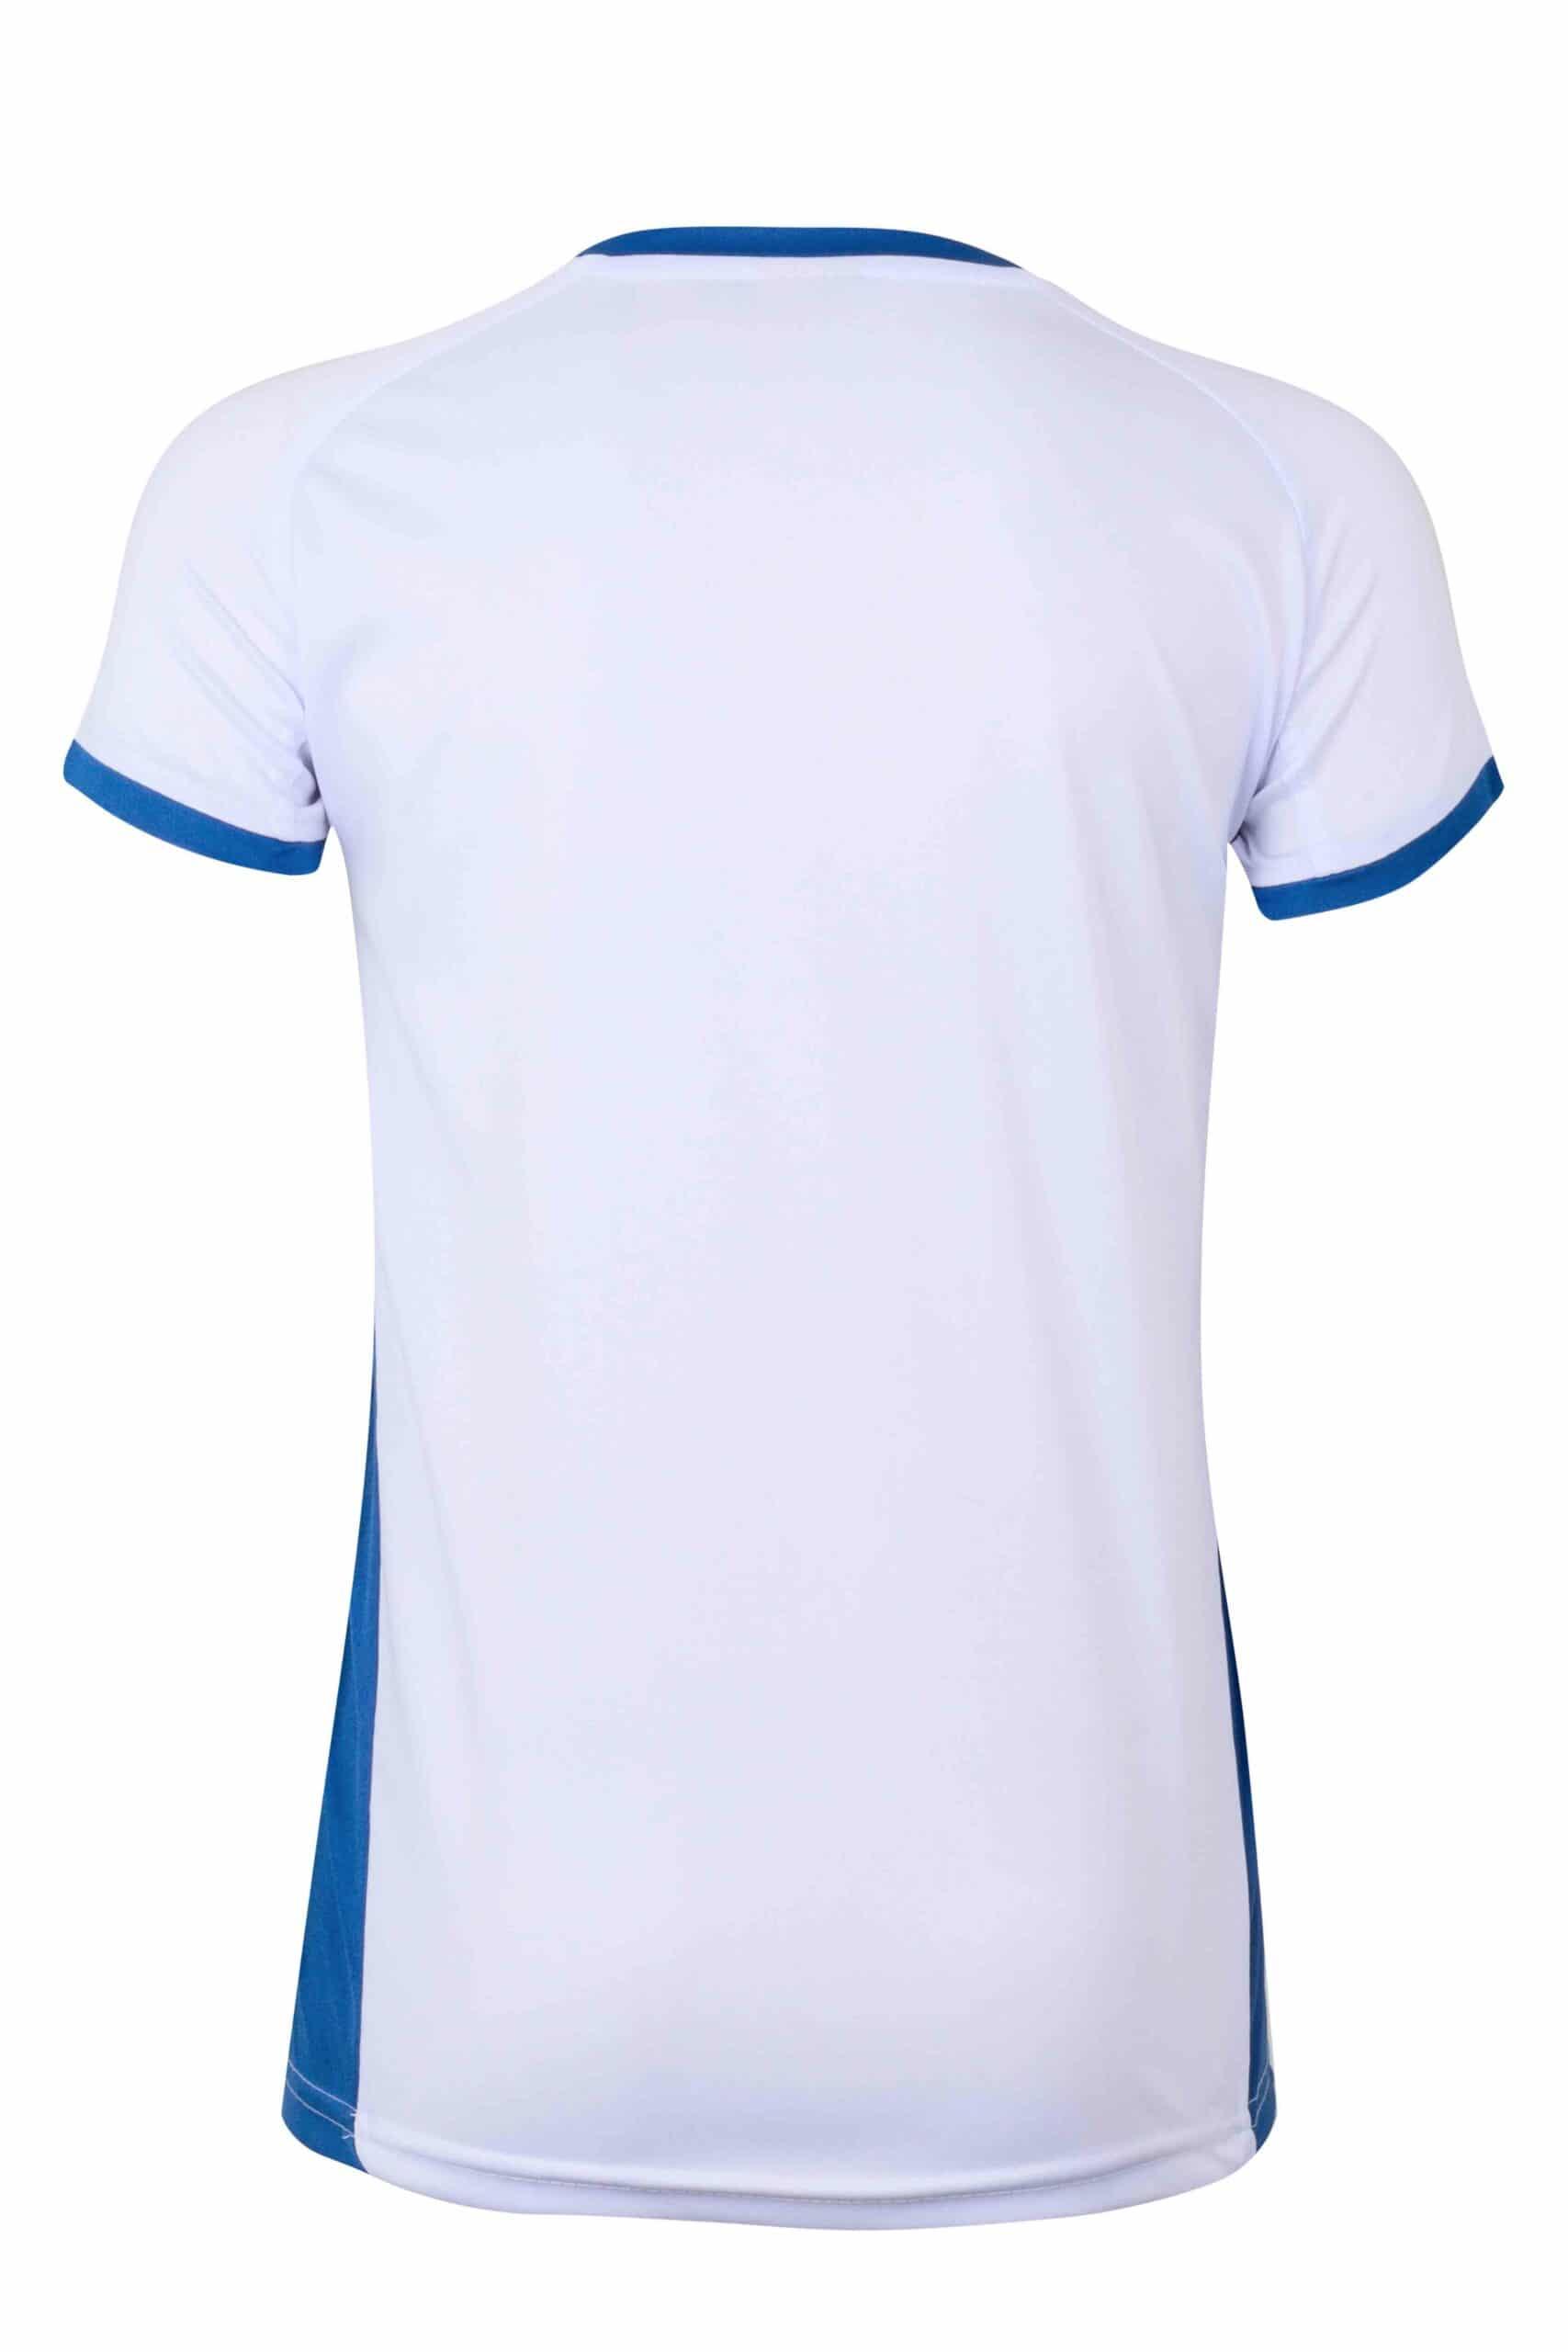 Mukua Mk531v Camiseta TÉcnica Manga Corta Bicolor NiÑo White Royal Blue 2